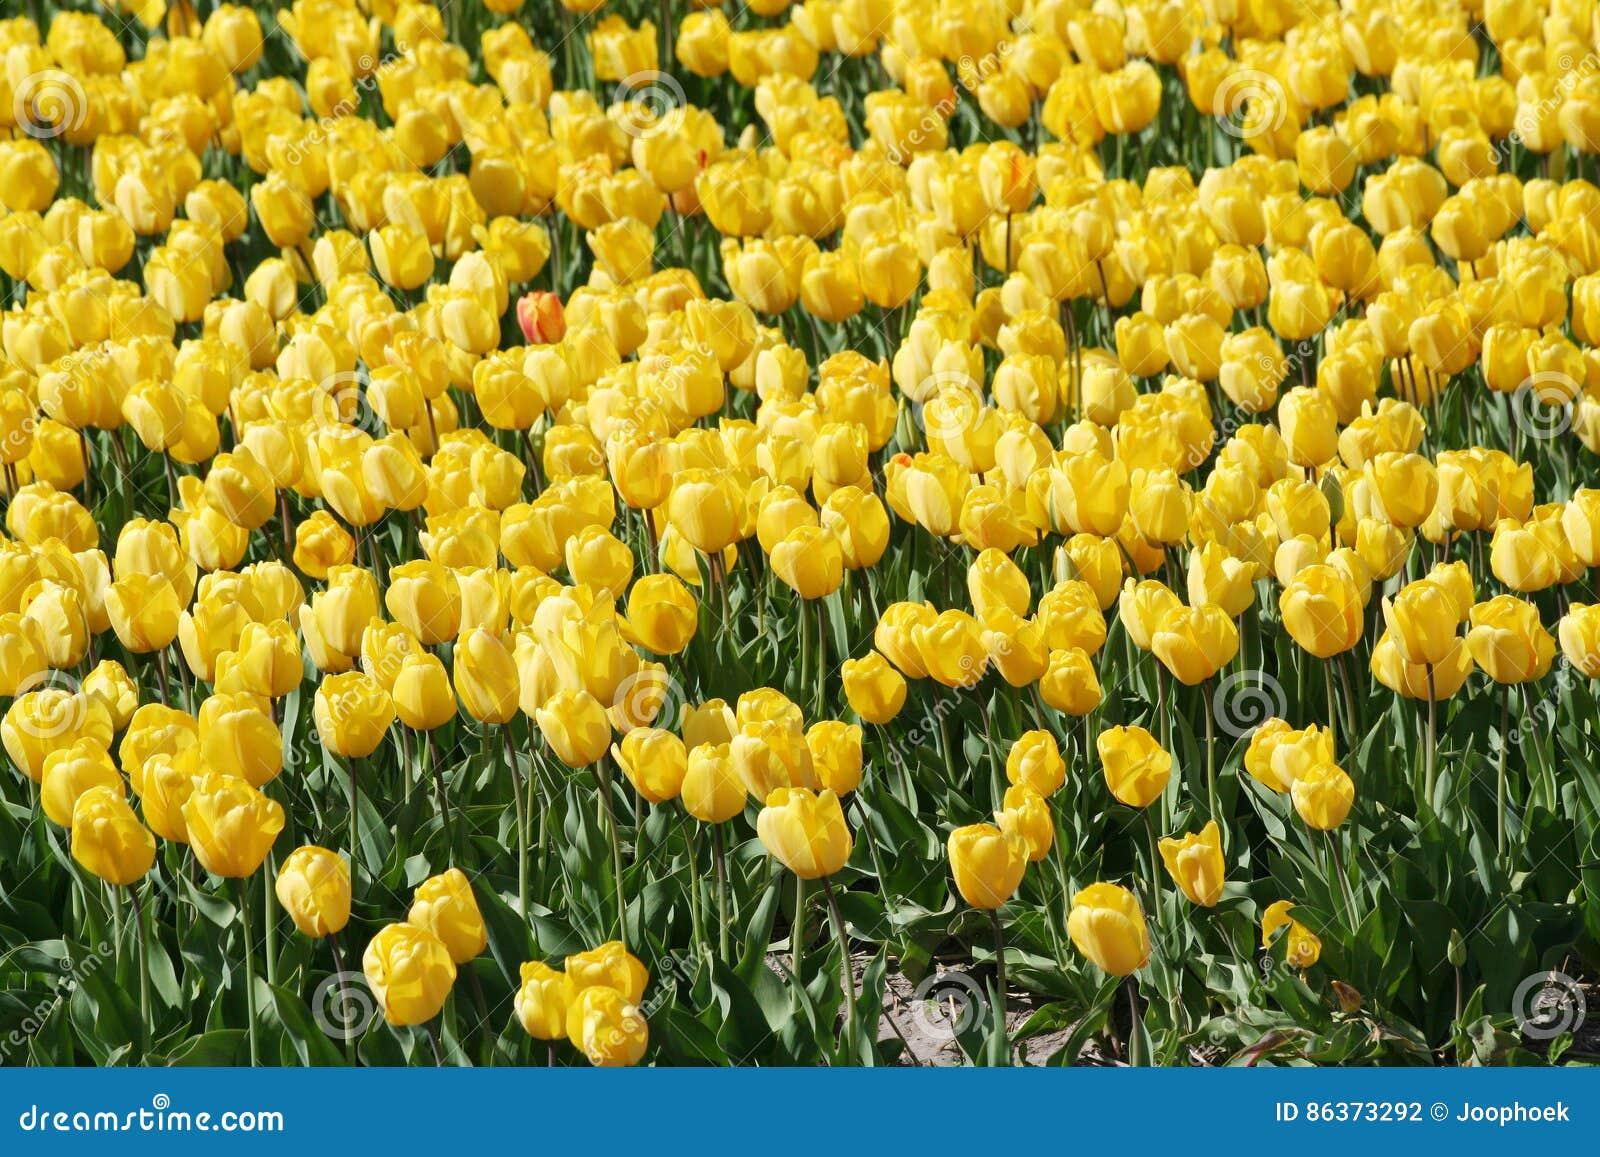 Yellow Flower Bulbs Field Stock Photo Image Of Hyacint 86373292